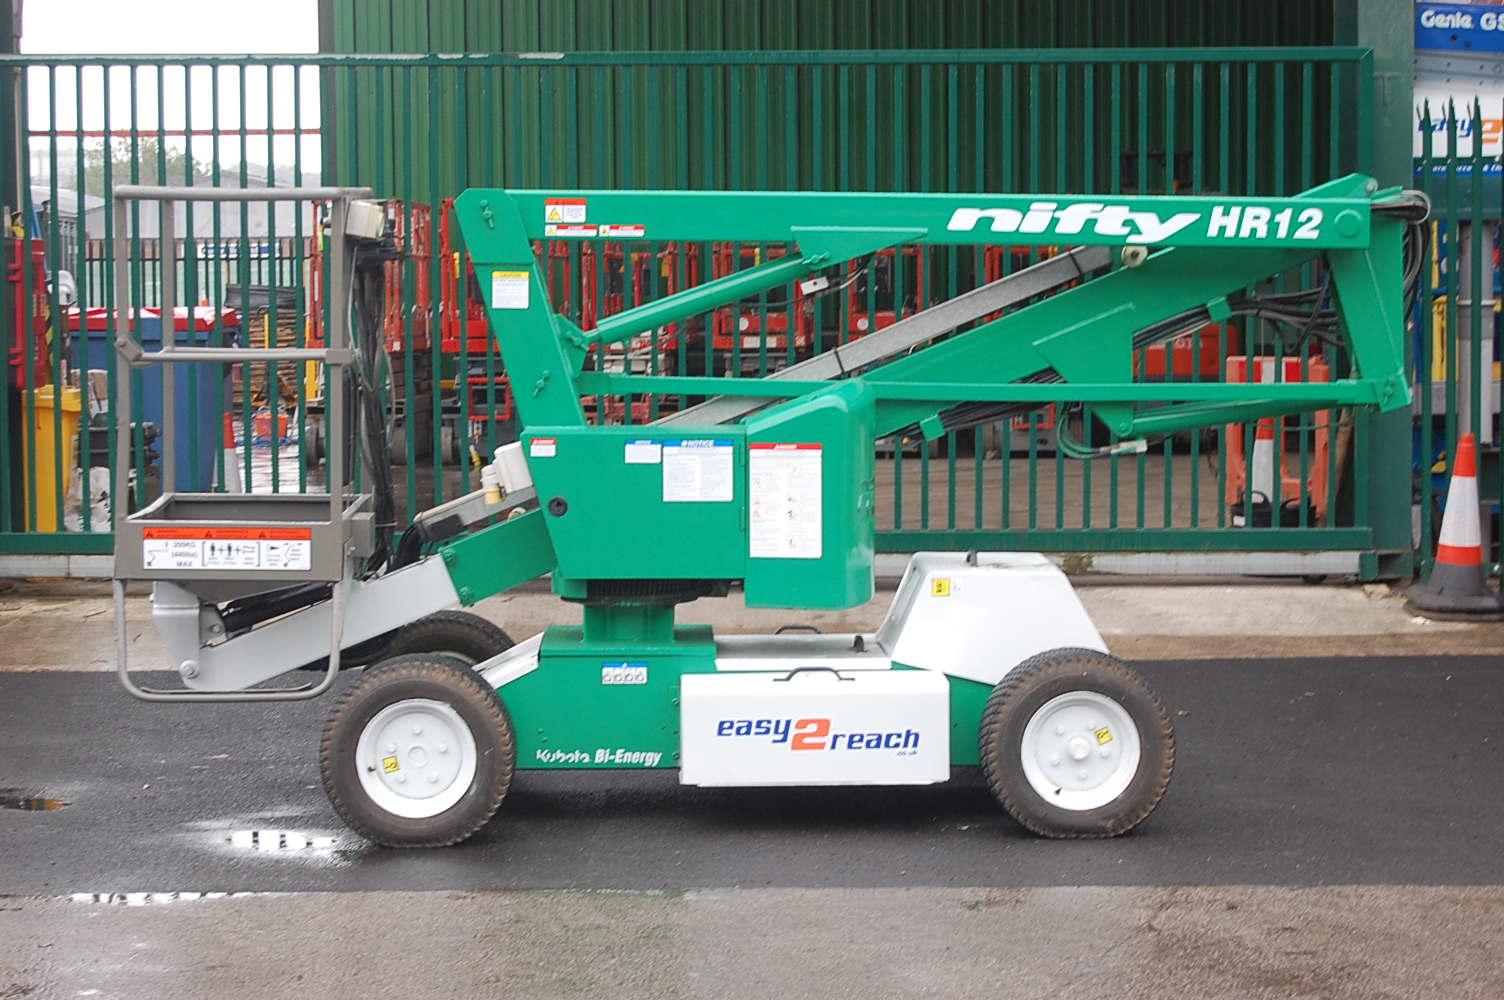 Niftylift HR12 NDE Bi-Energy 12m Boom Lift